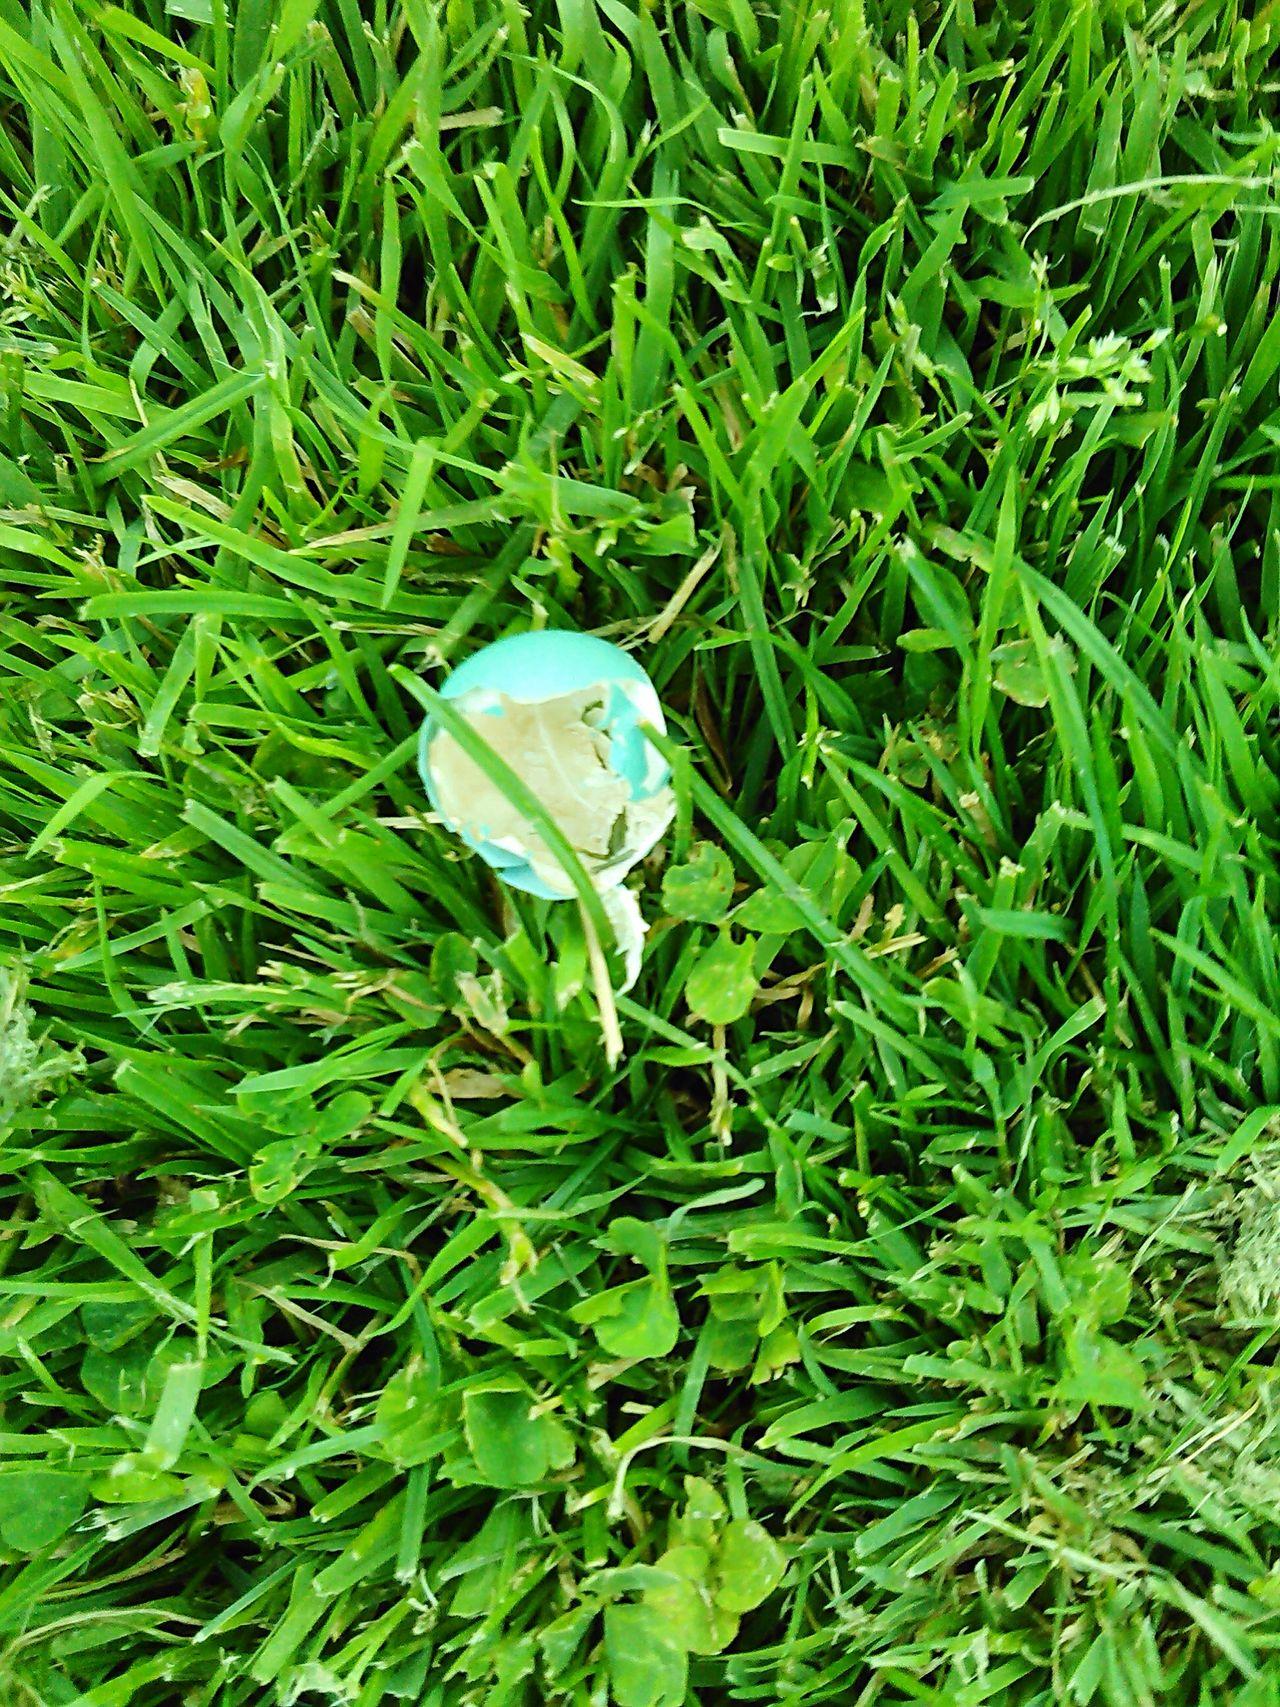 Birdsegg Blueegg Nature Real Natural Animals Babybird